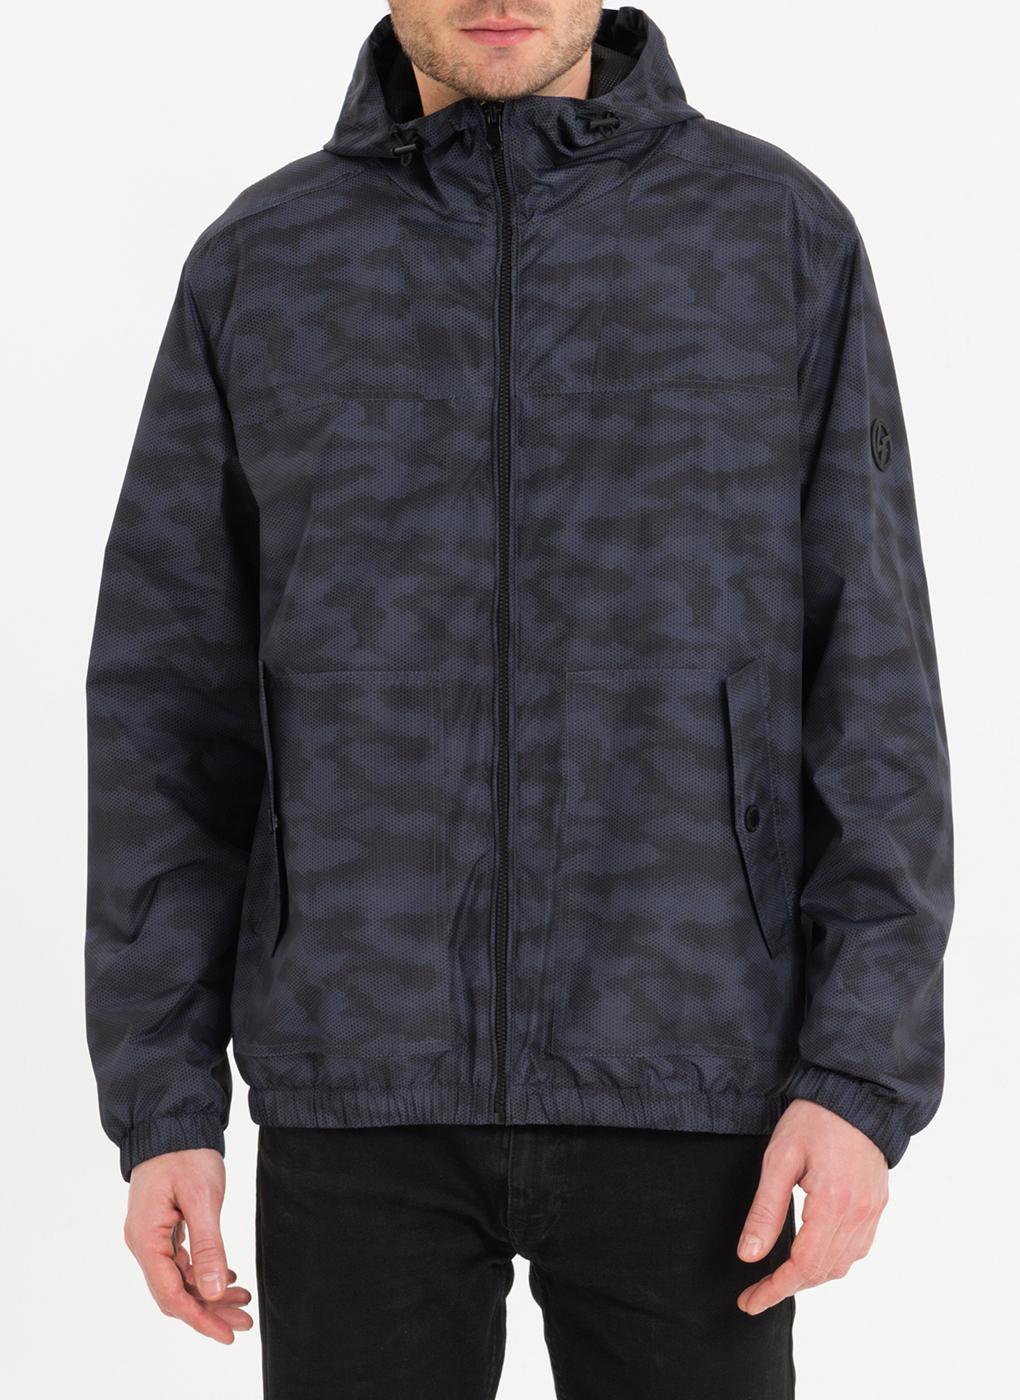 Куртка мужская 01, LAB FASHION фото